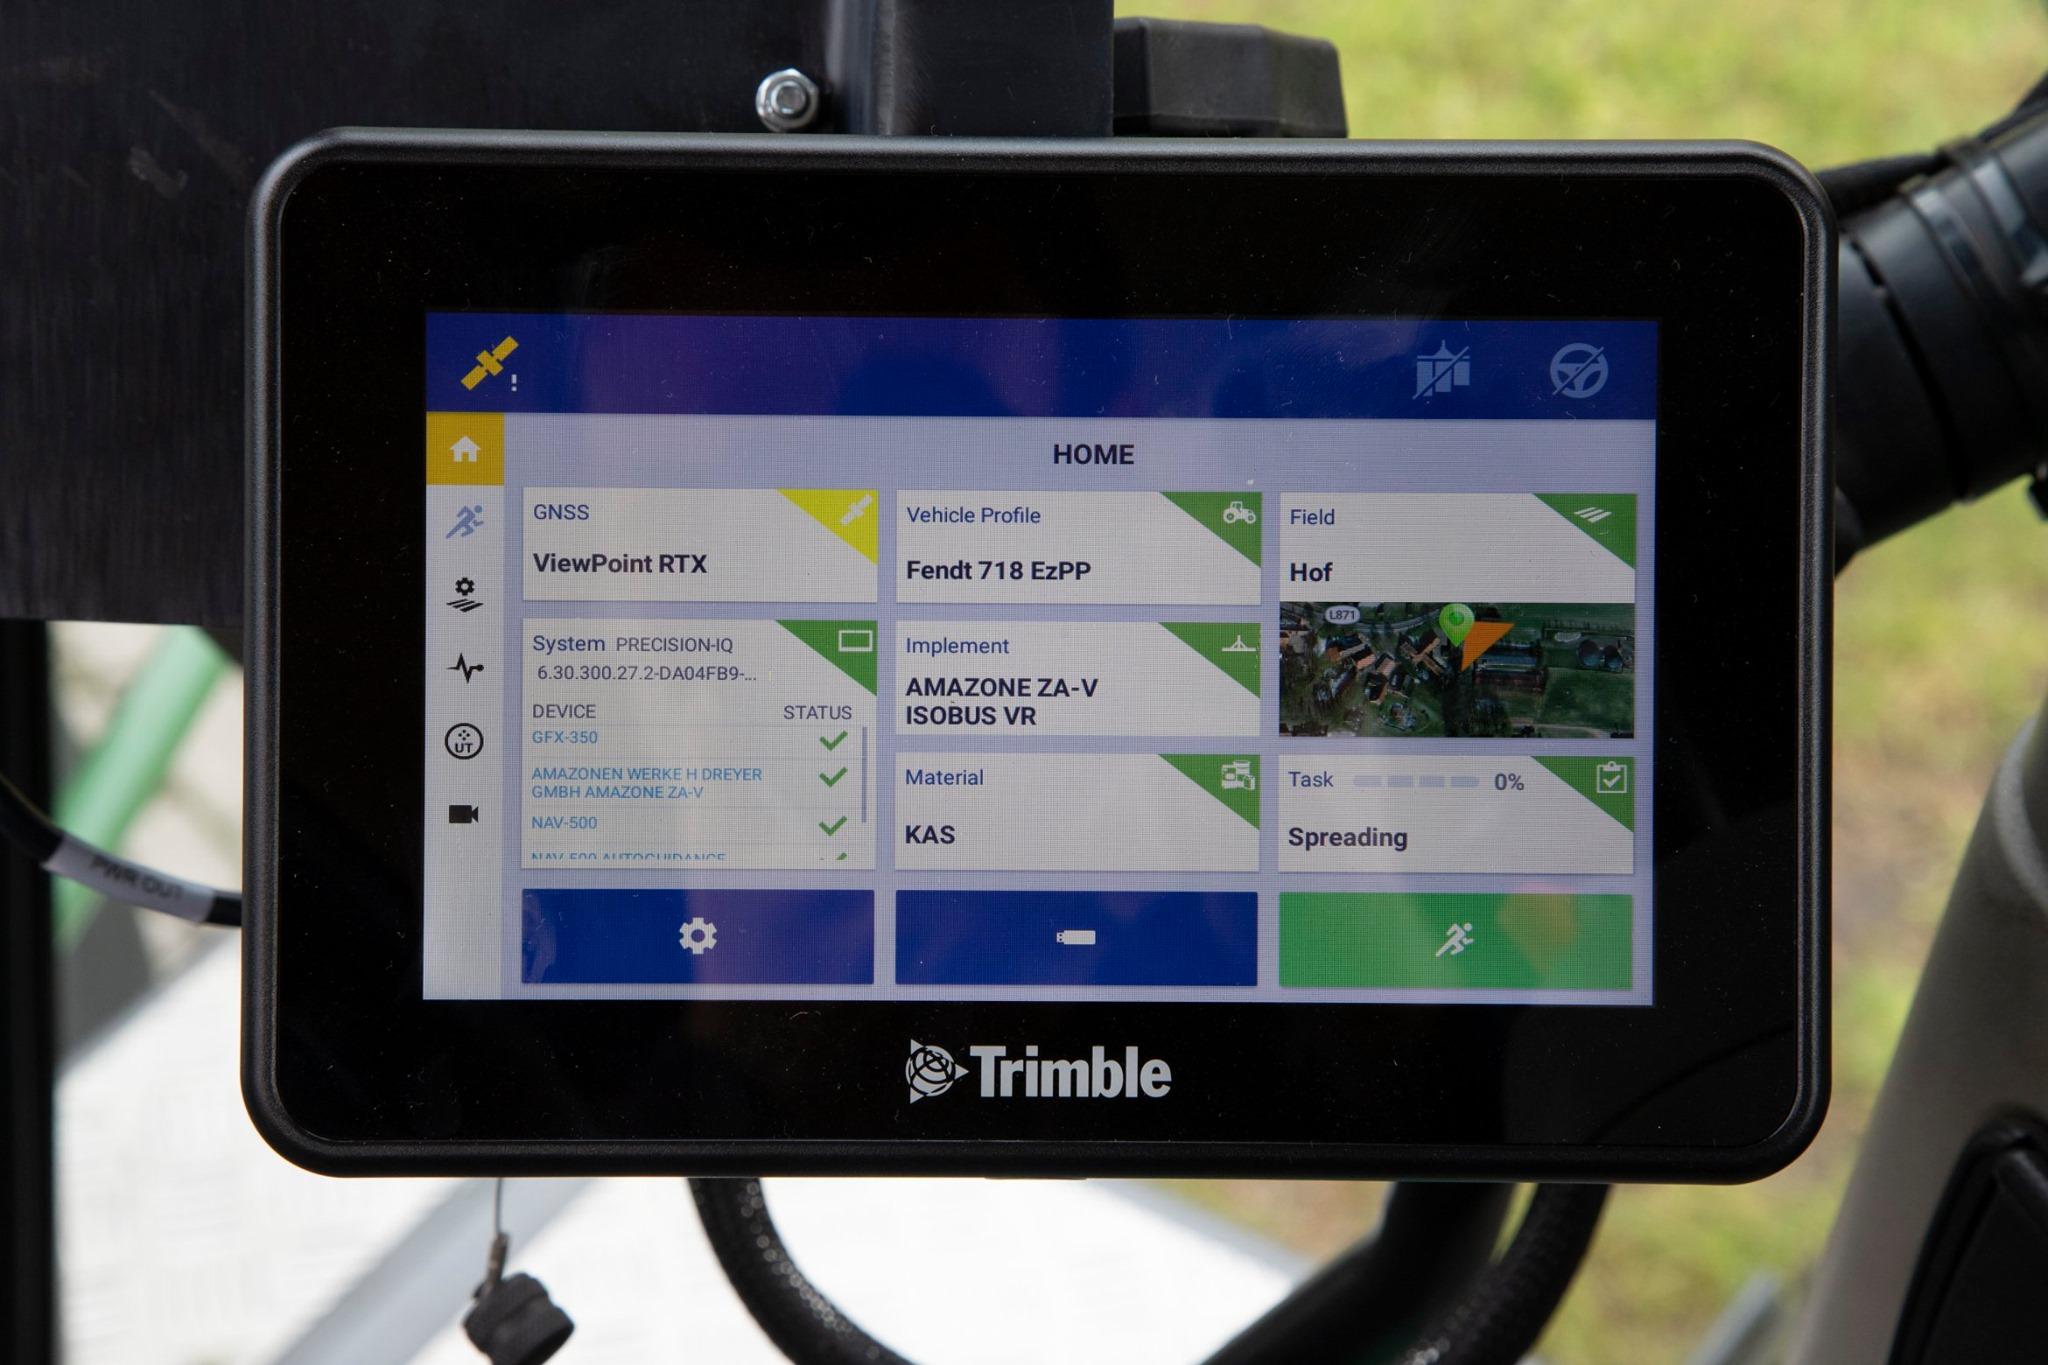 Nueva Trimble GFX-350